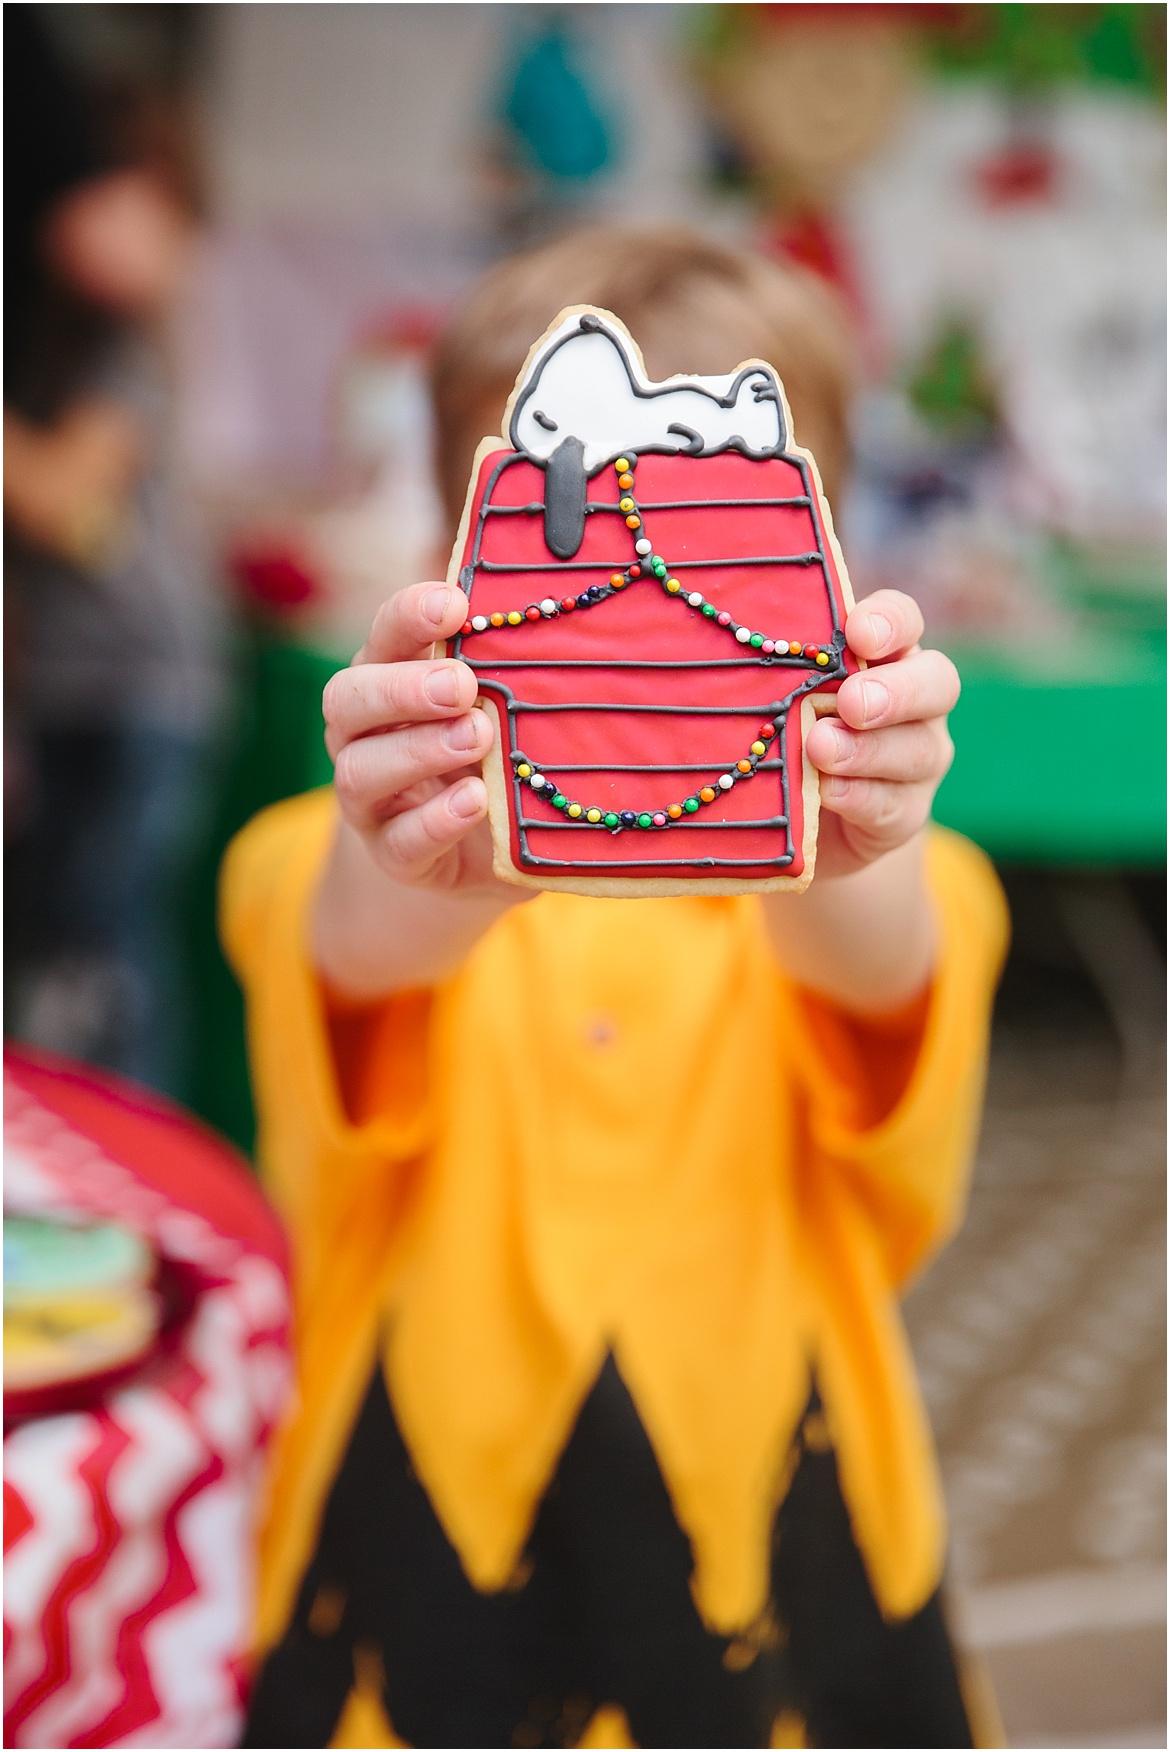 828 Bakes | Charlie Brown Peanuts Party